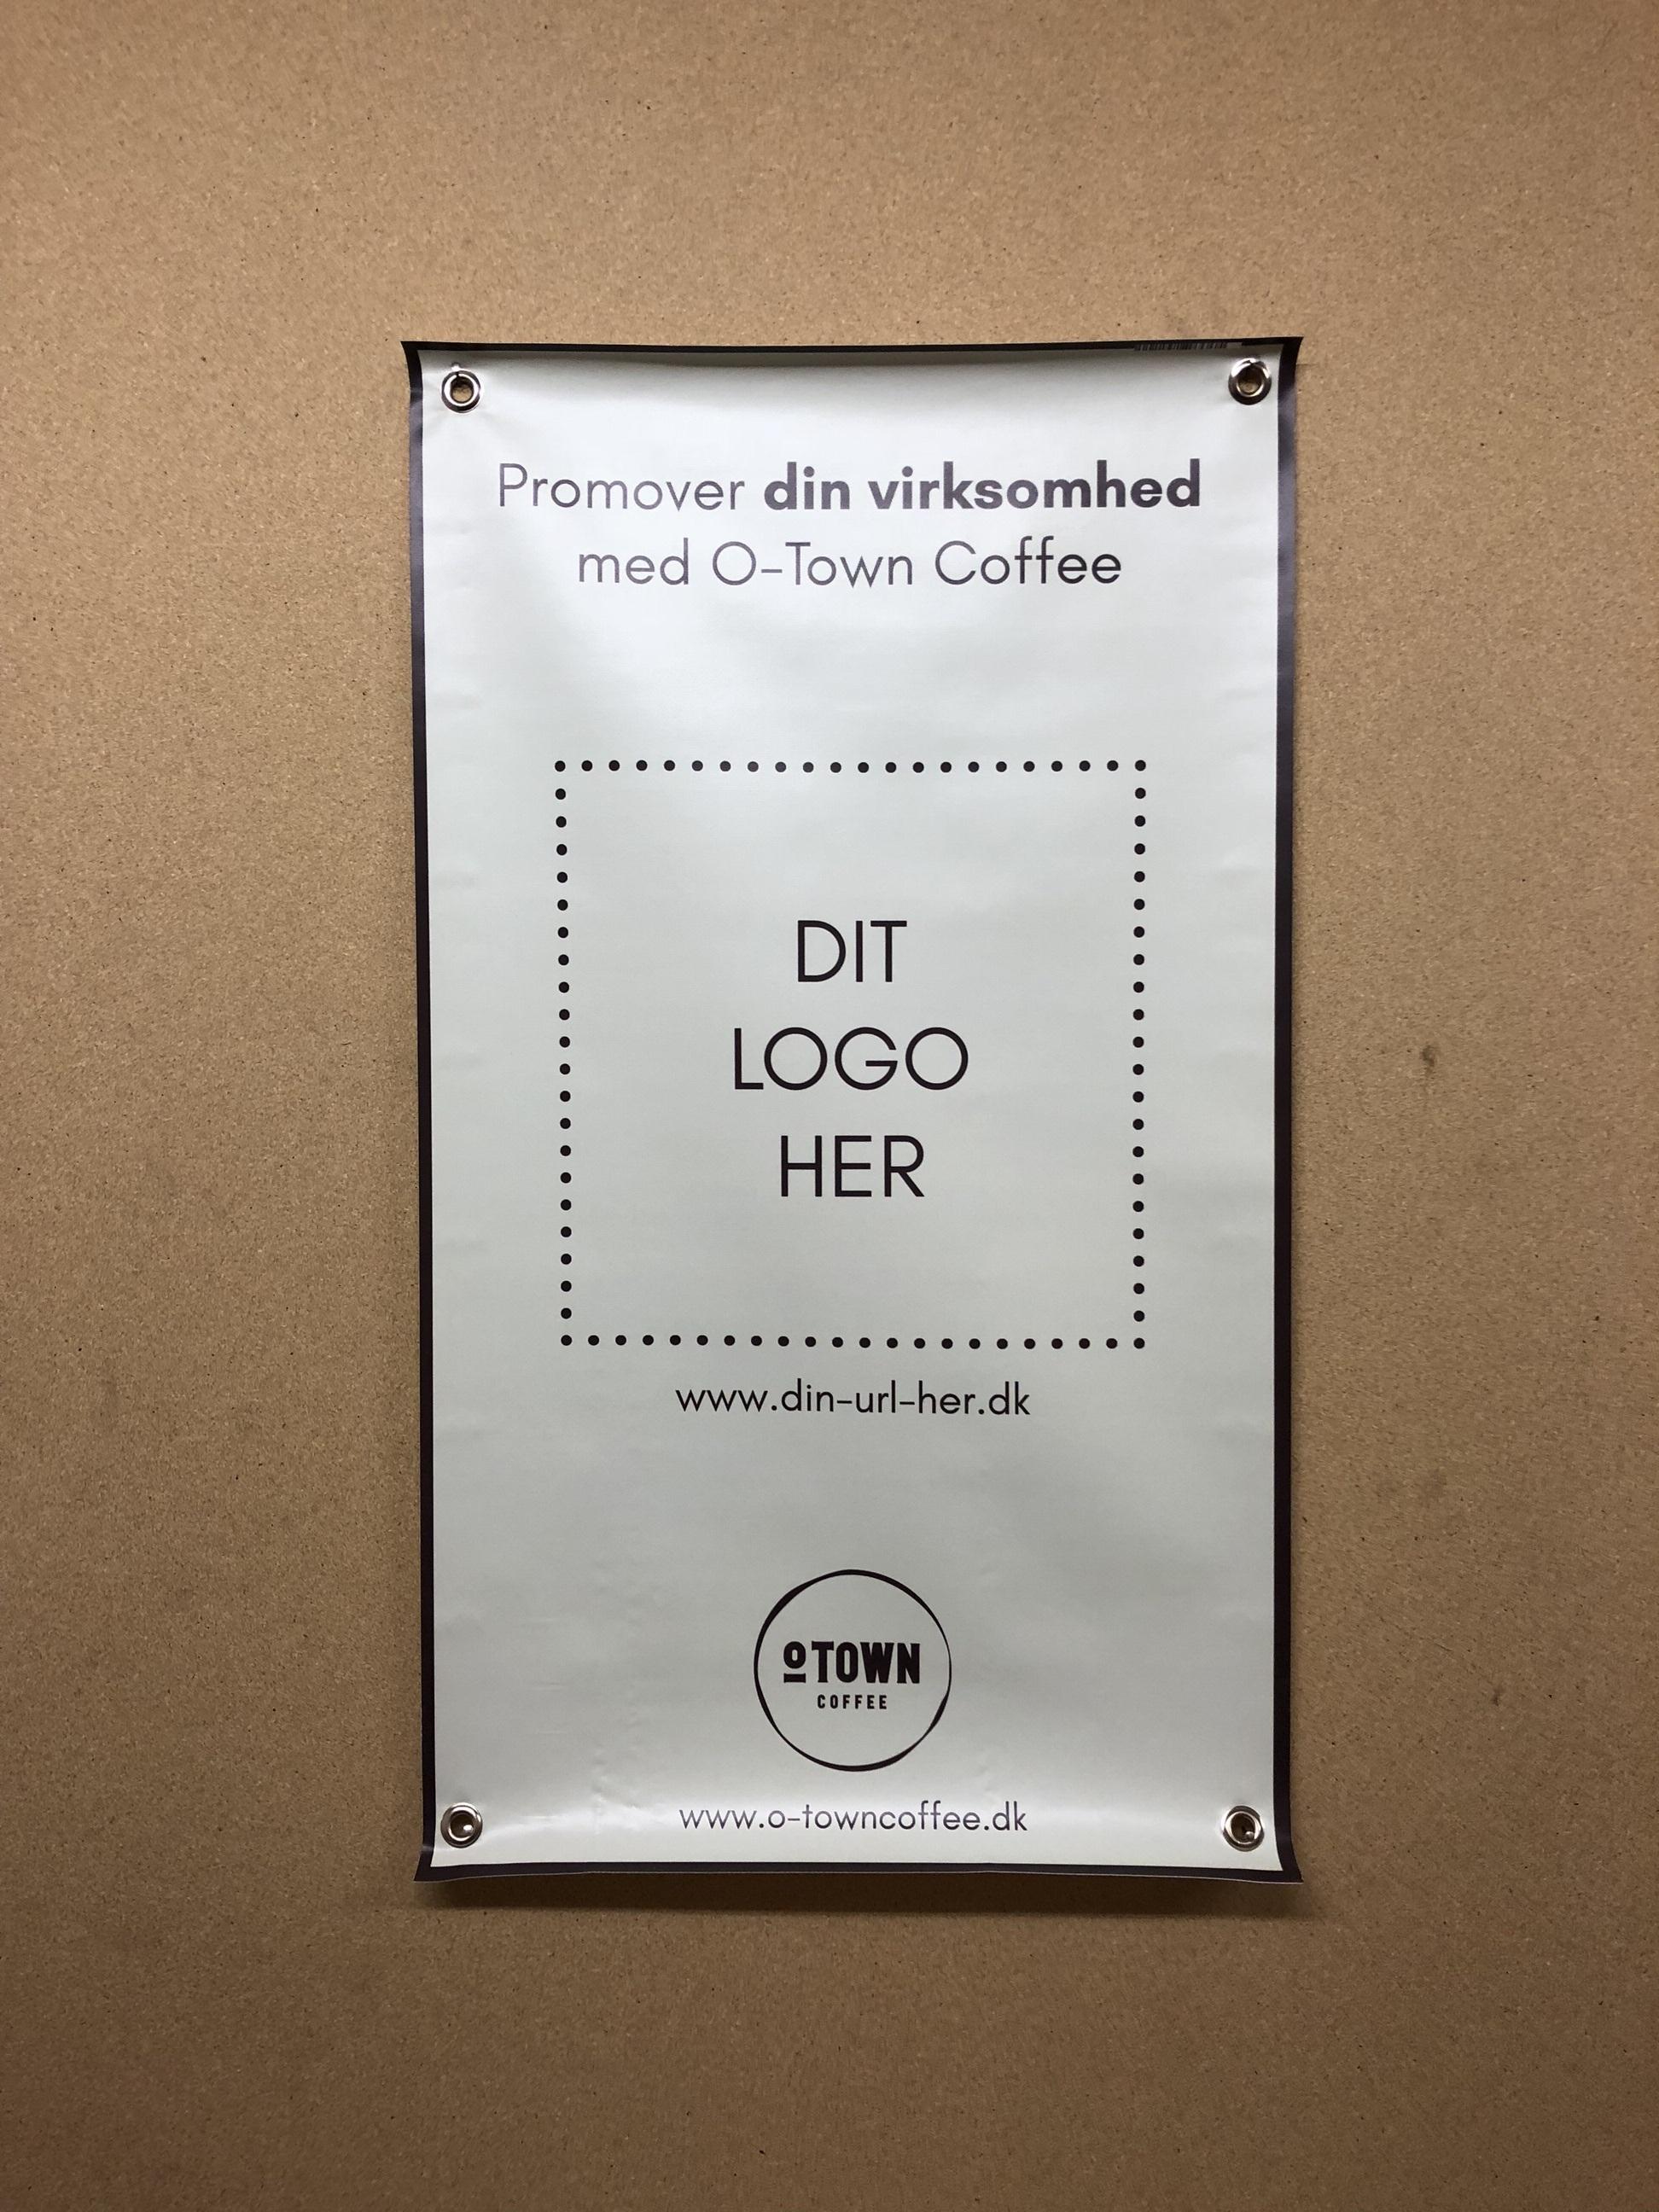 O-Town Coffee Virksomhedsbranding 5